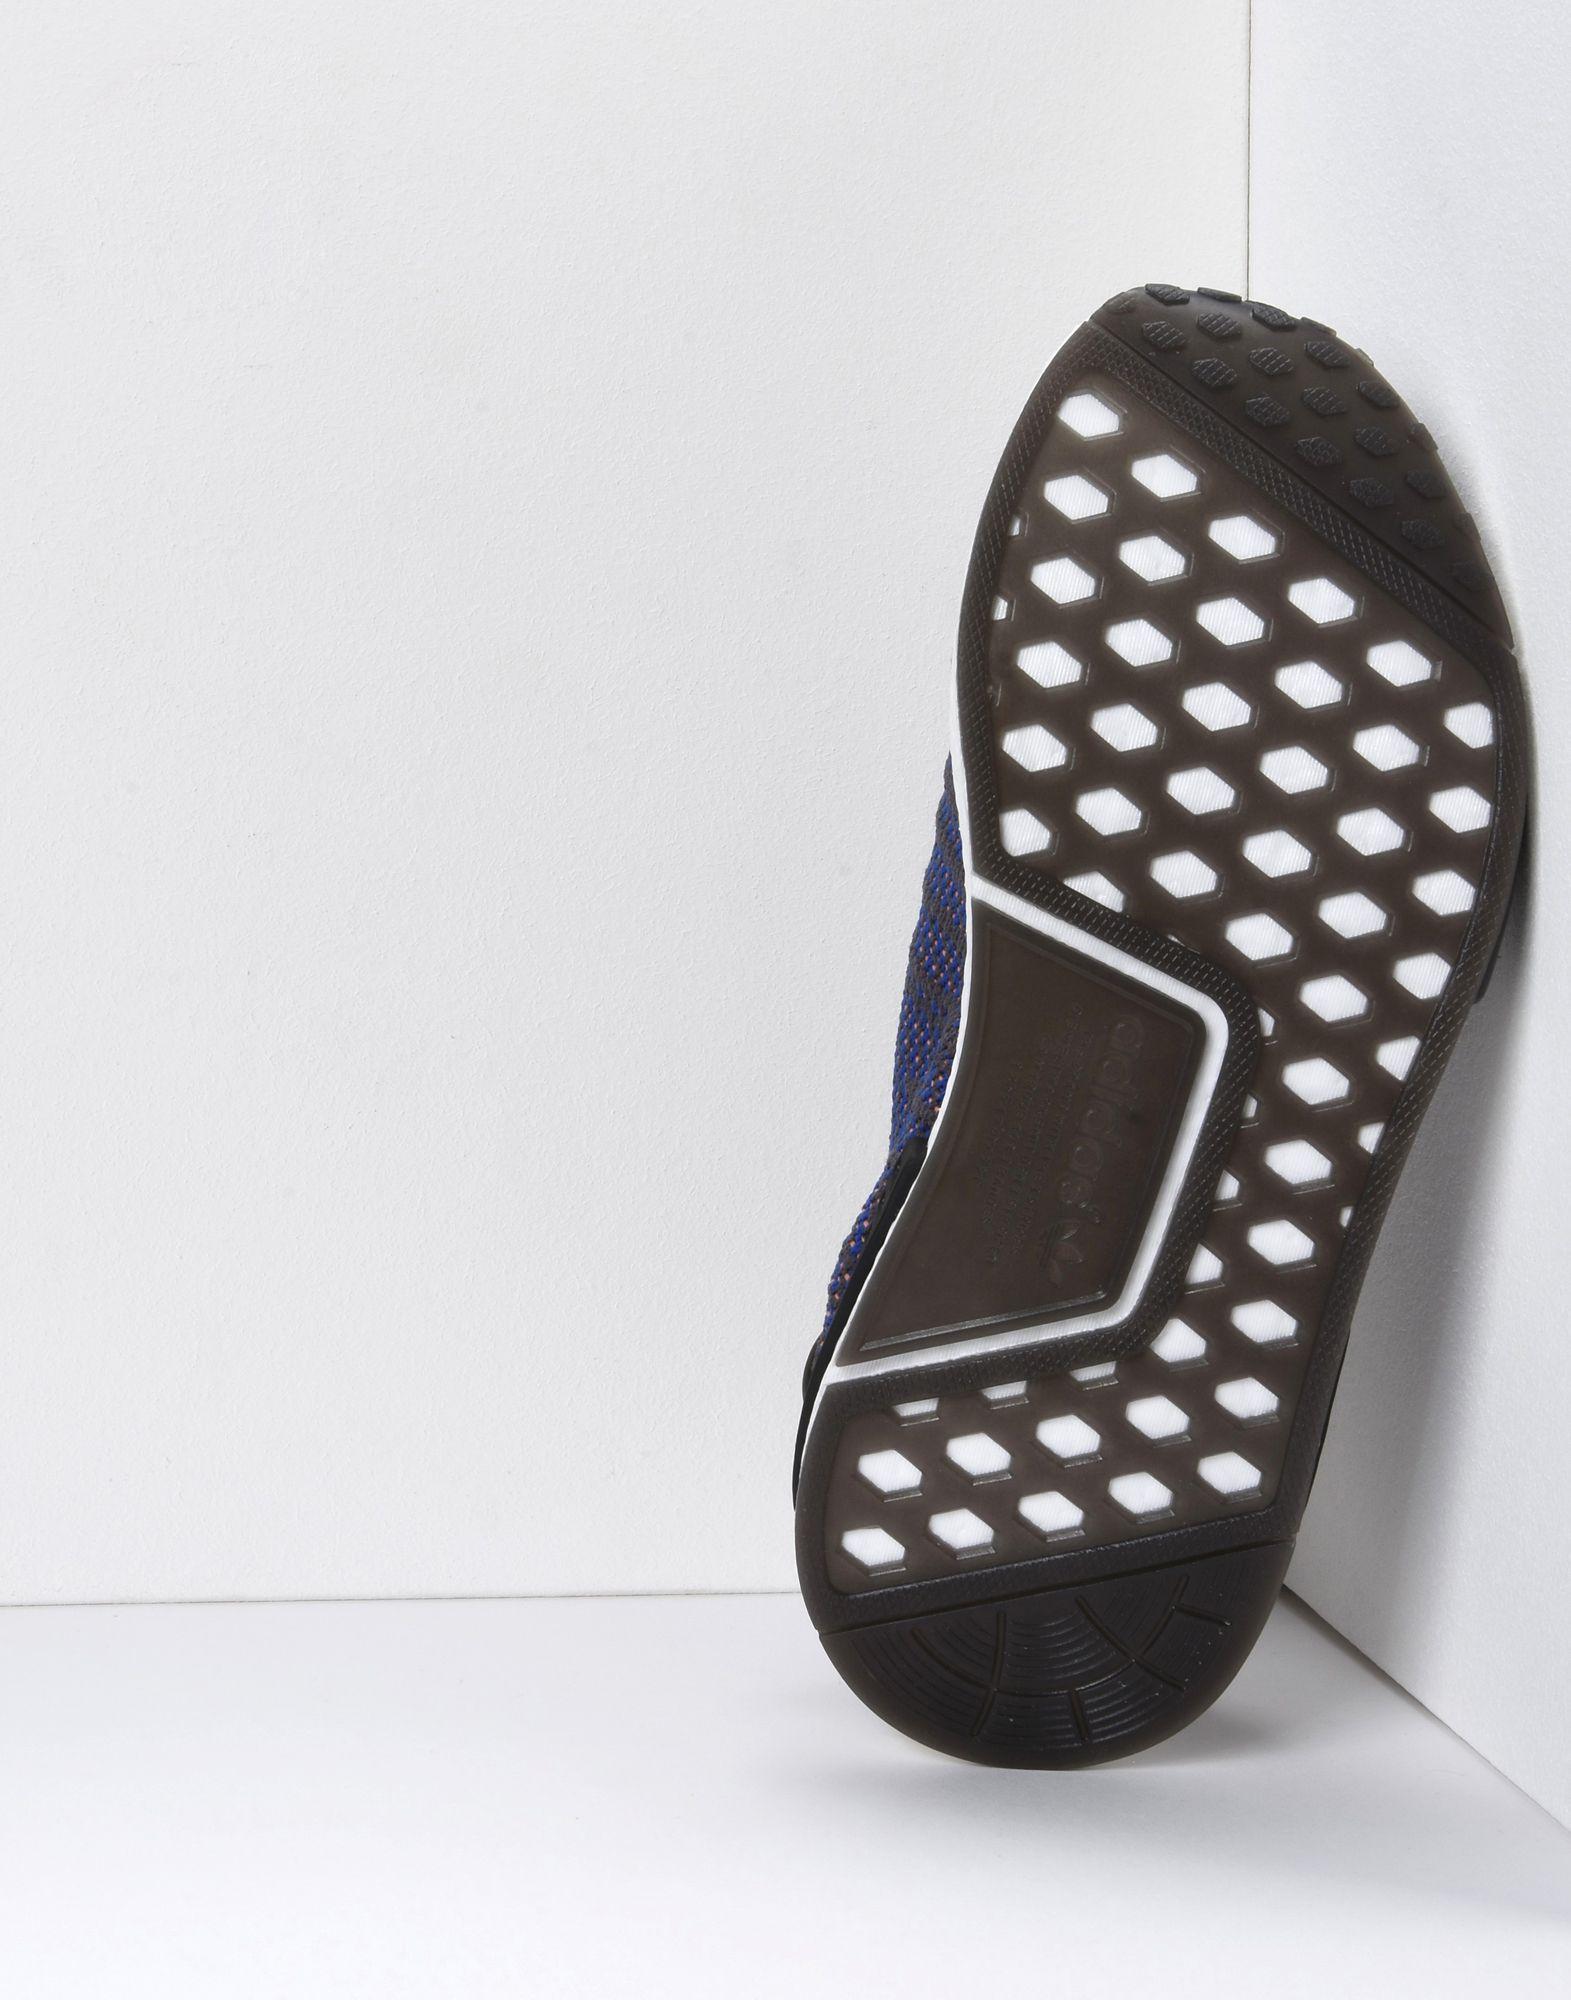 Adidas Adidas Adidas Originals Nmd_R1 Stlt Pk - Sneakers - Men Adidas Originals Sneakers online on  Australia - 11446301NB 60c38f